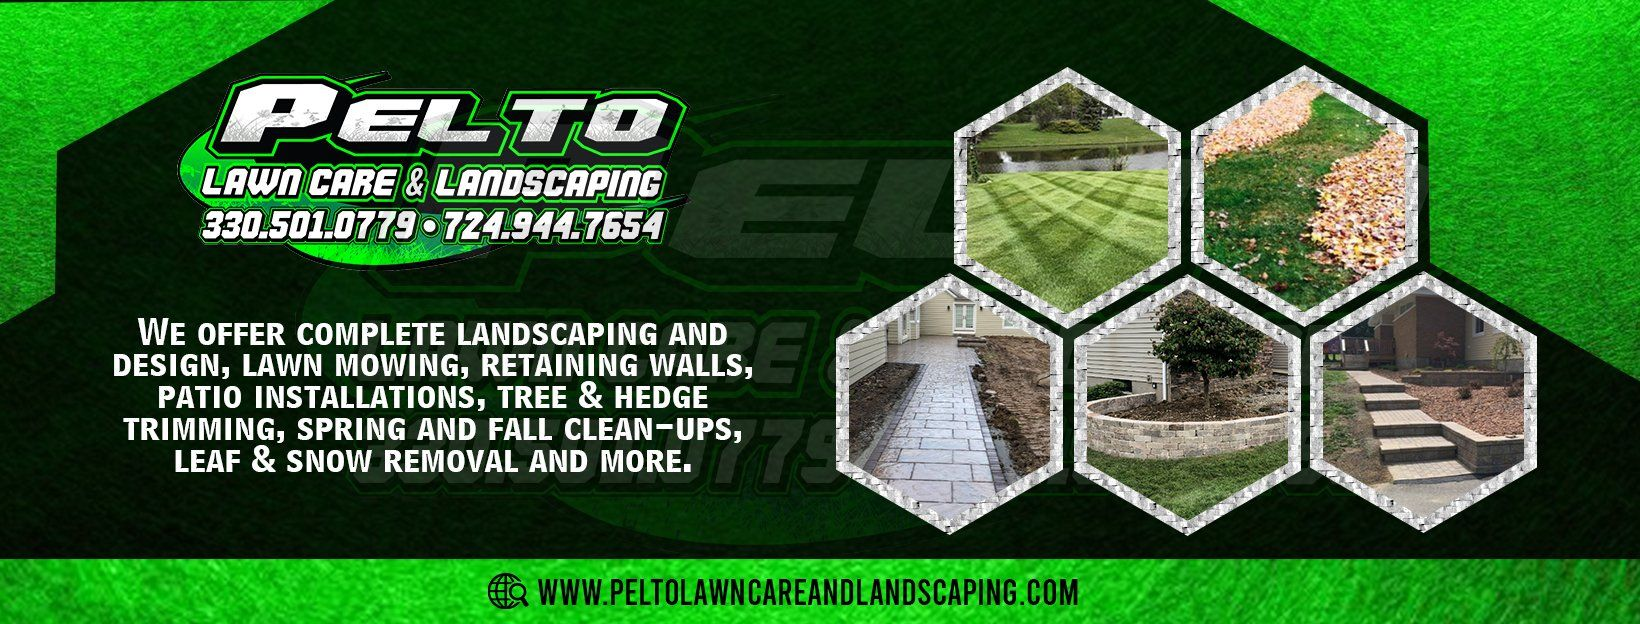 Professional Landscaper Edinburg Pa Pelto Lawn Care And Landscaping